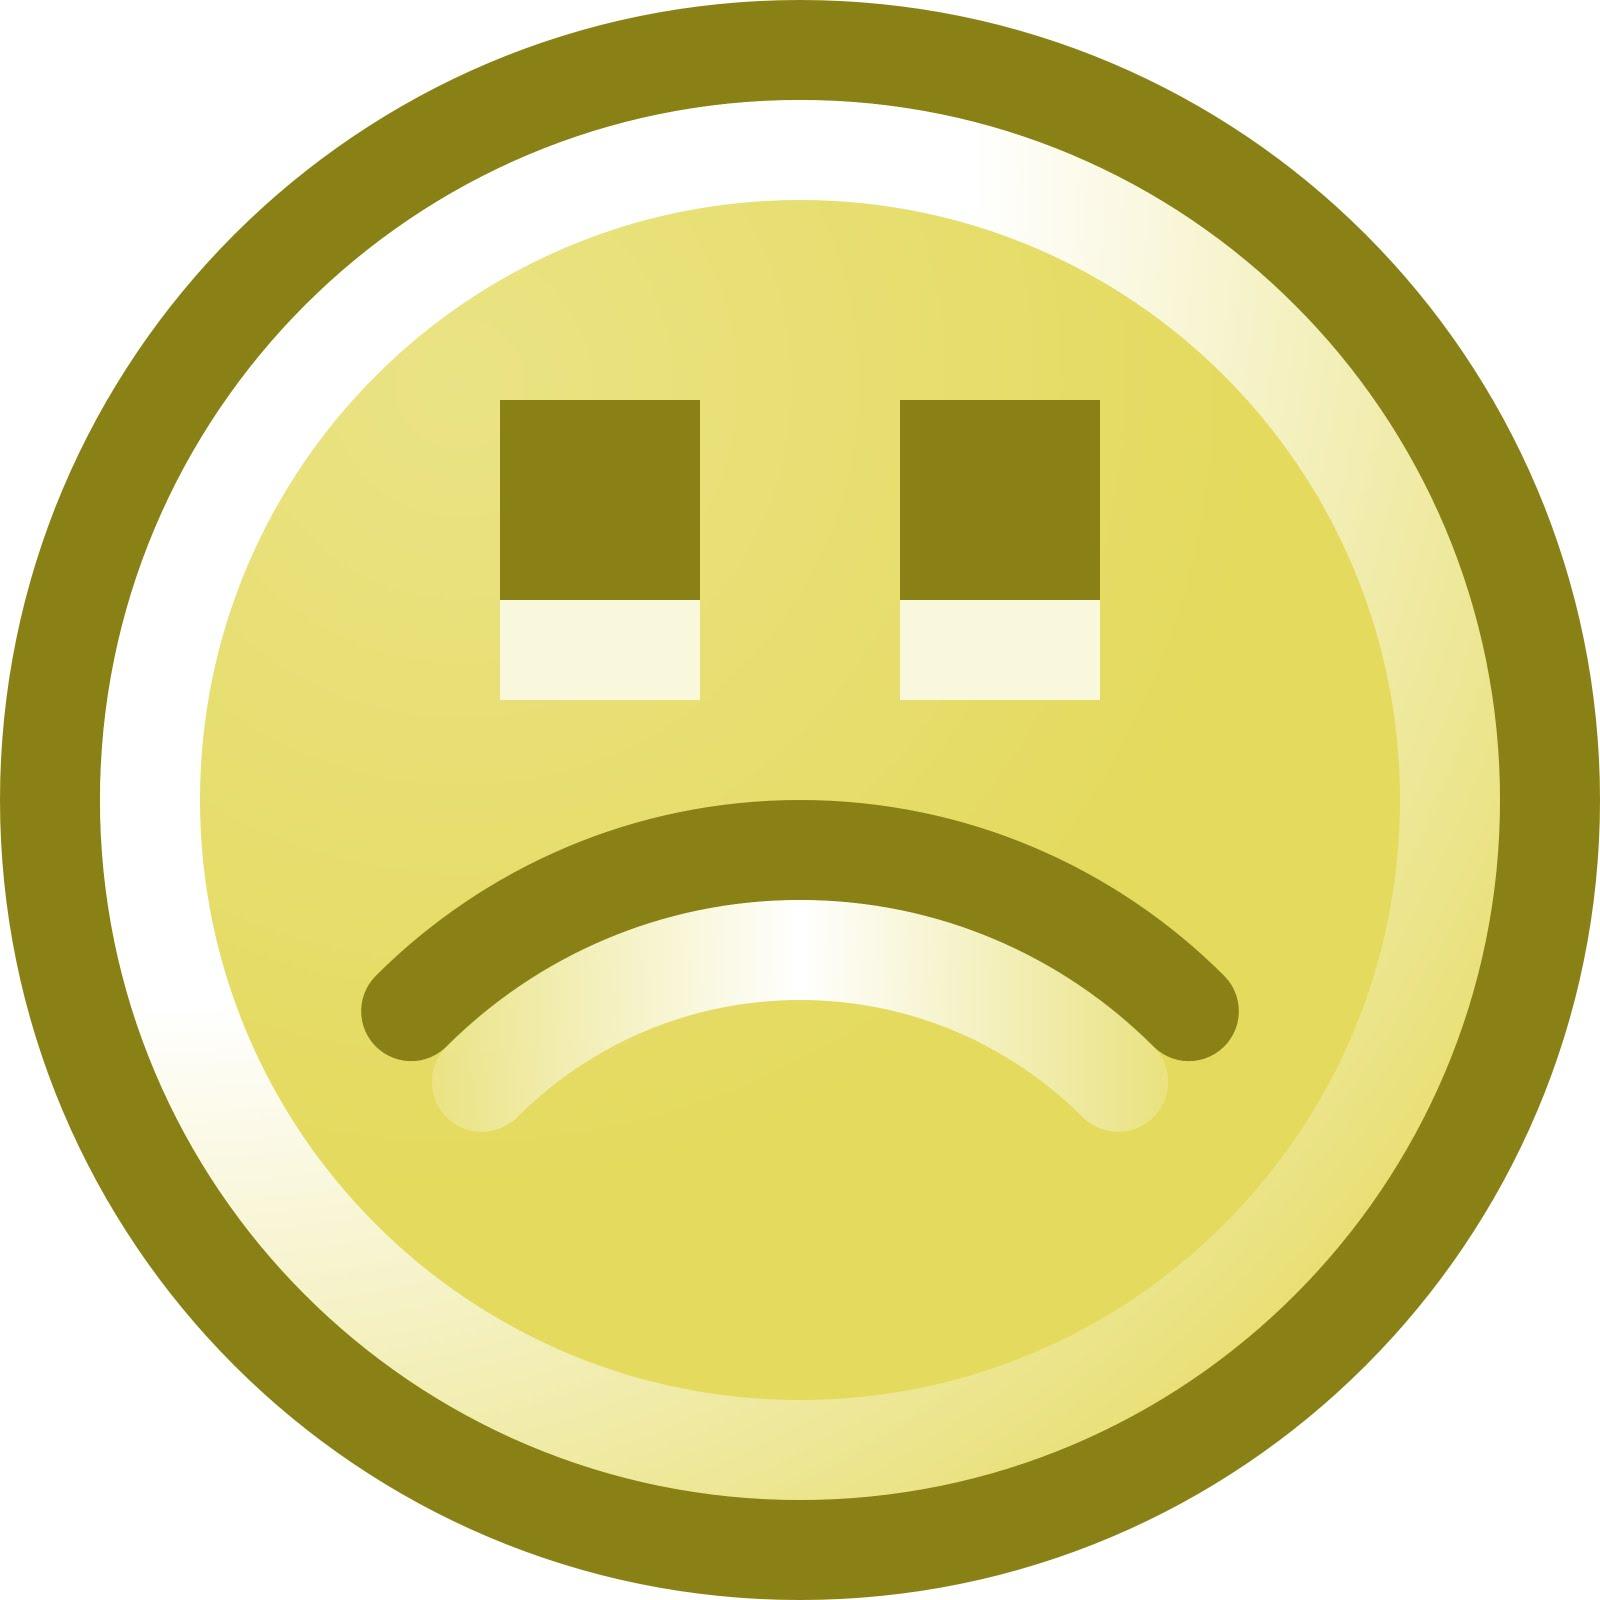 Depression clipart mood Clipart mood%20clipart depression%20clipart Mood Panda